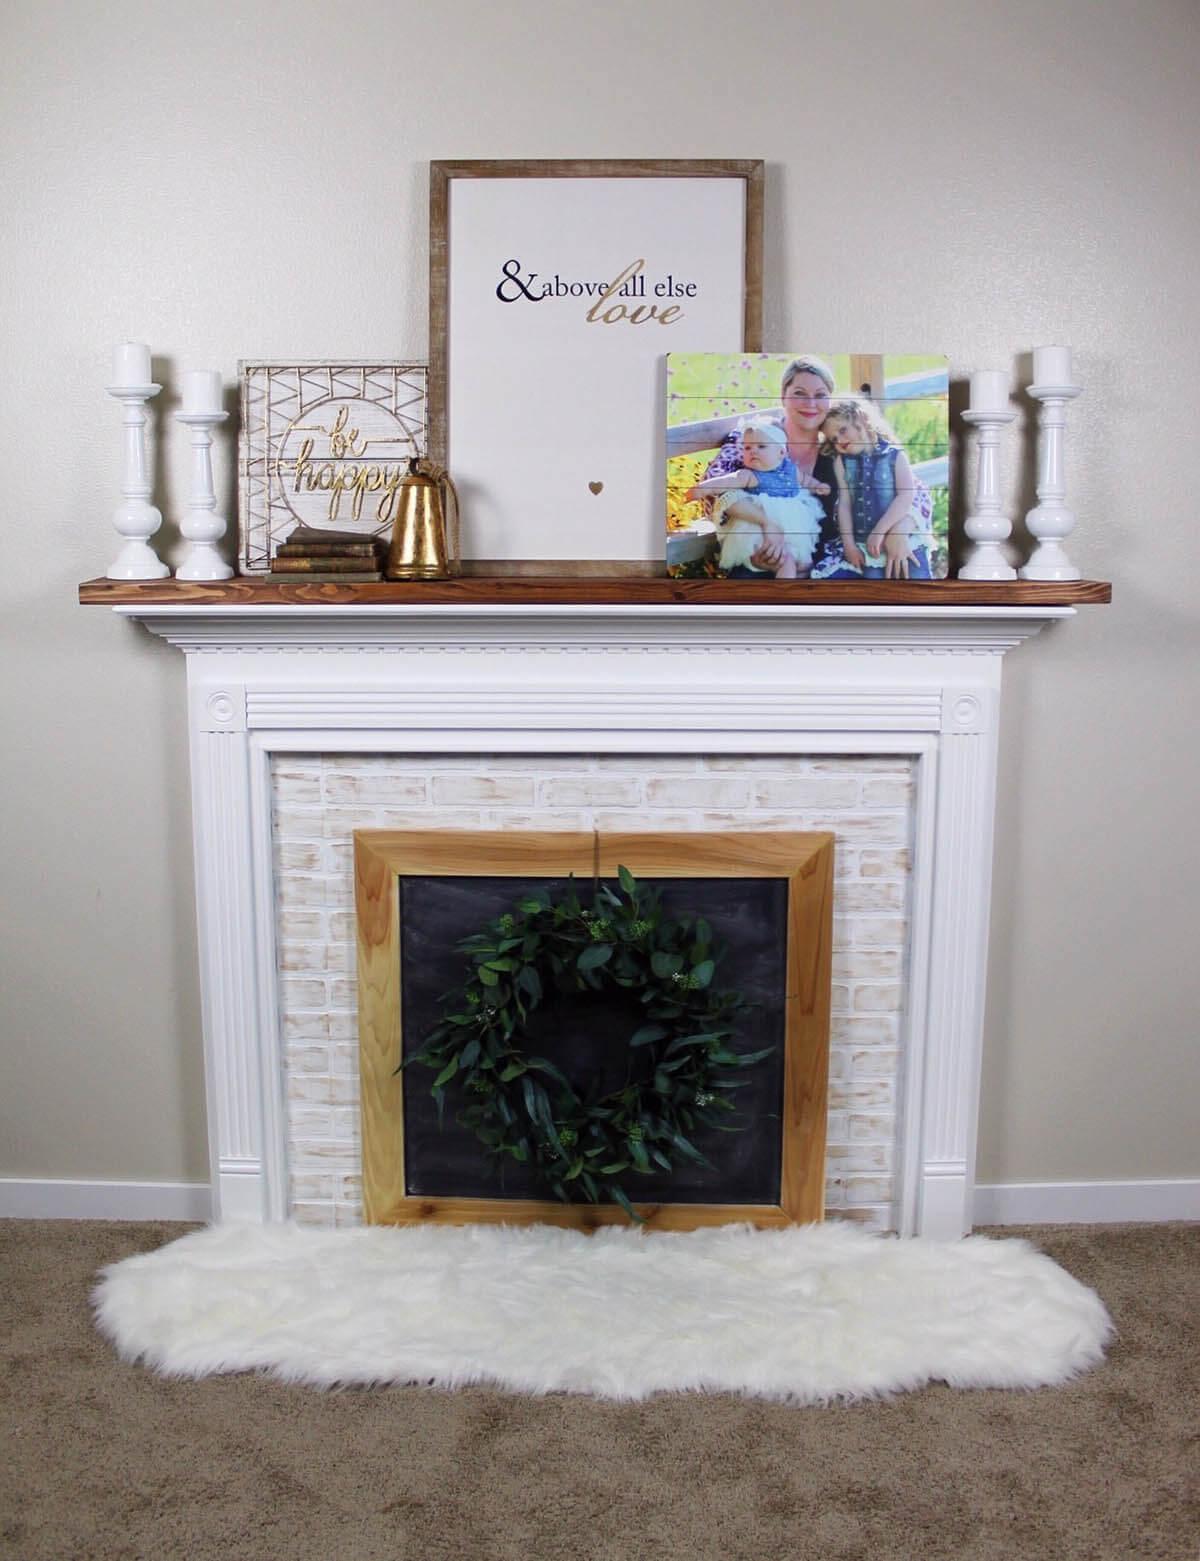 Timeless Whitewashed Brick and Wood Framed Fireplace